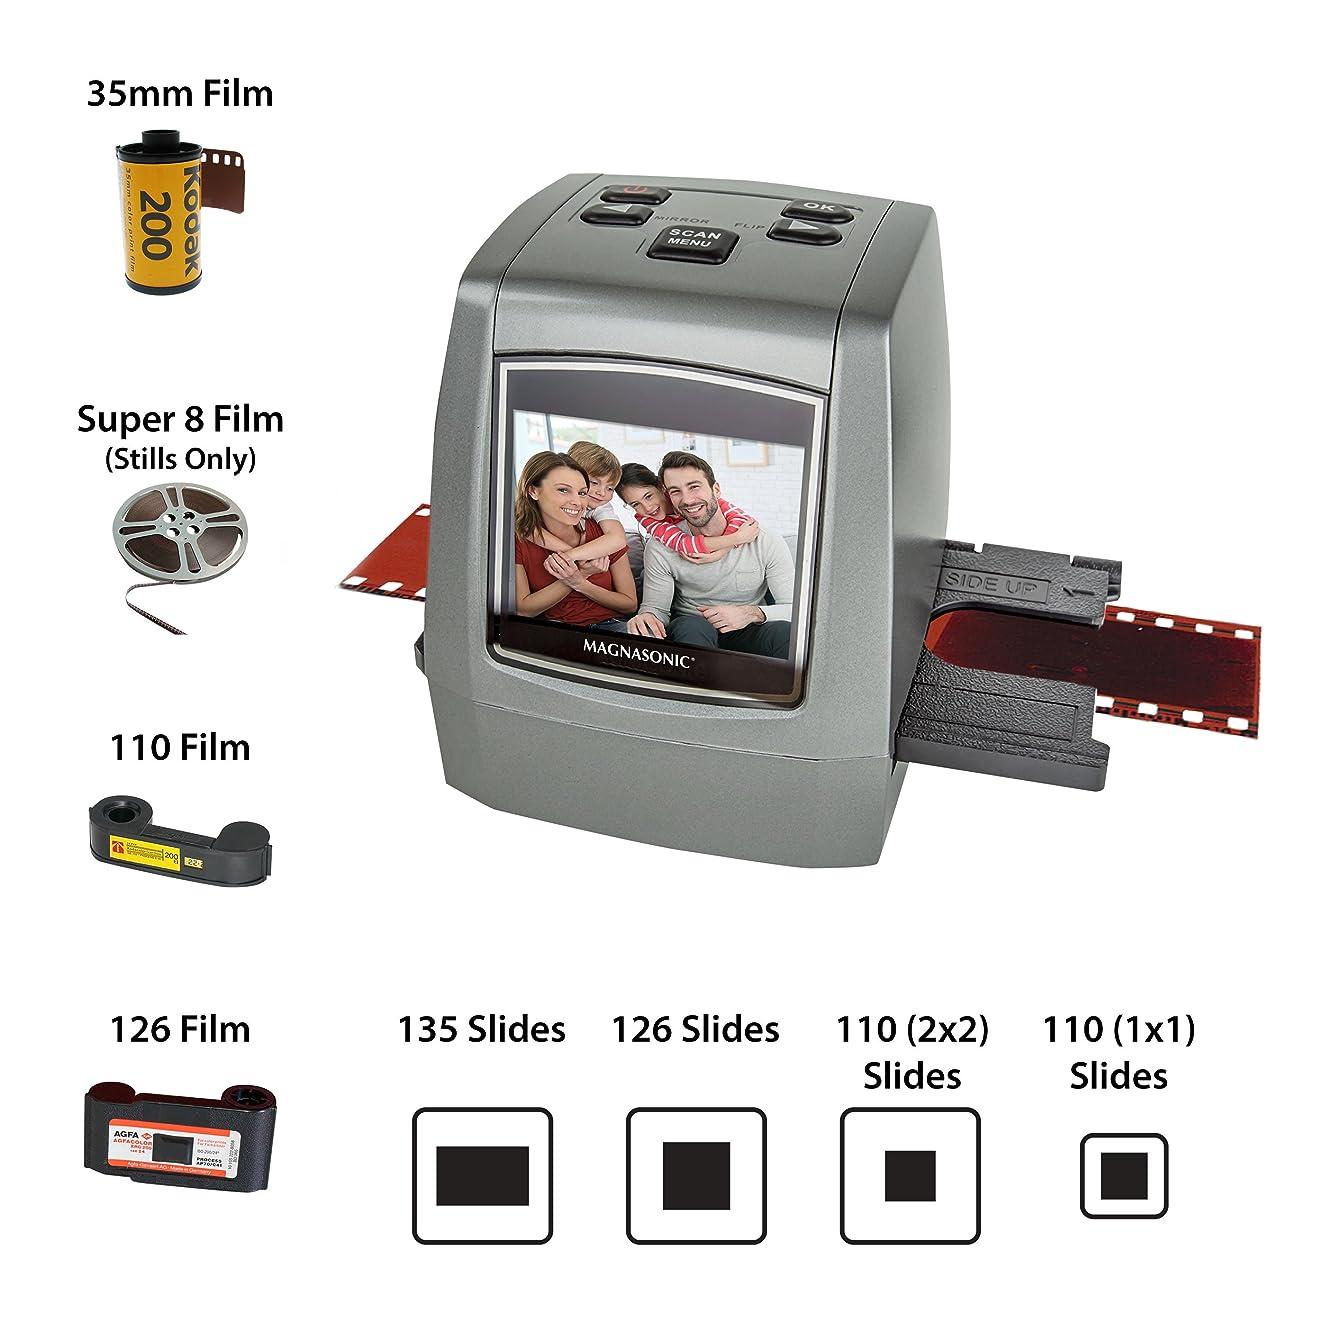 Magnasonic All-in-One High Resolution 22MP Film Scanner, Converts 35mm/126KPK/110/Super 8 Films, Slides, Negatives into Digital Photos, Vibrant 2.4